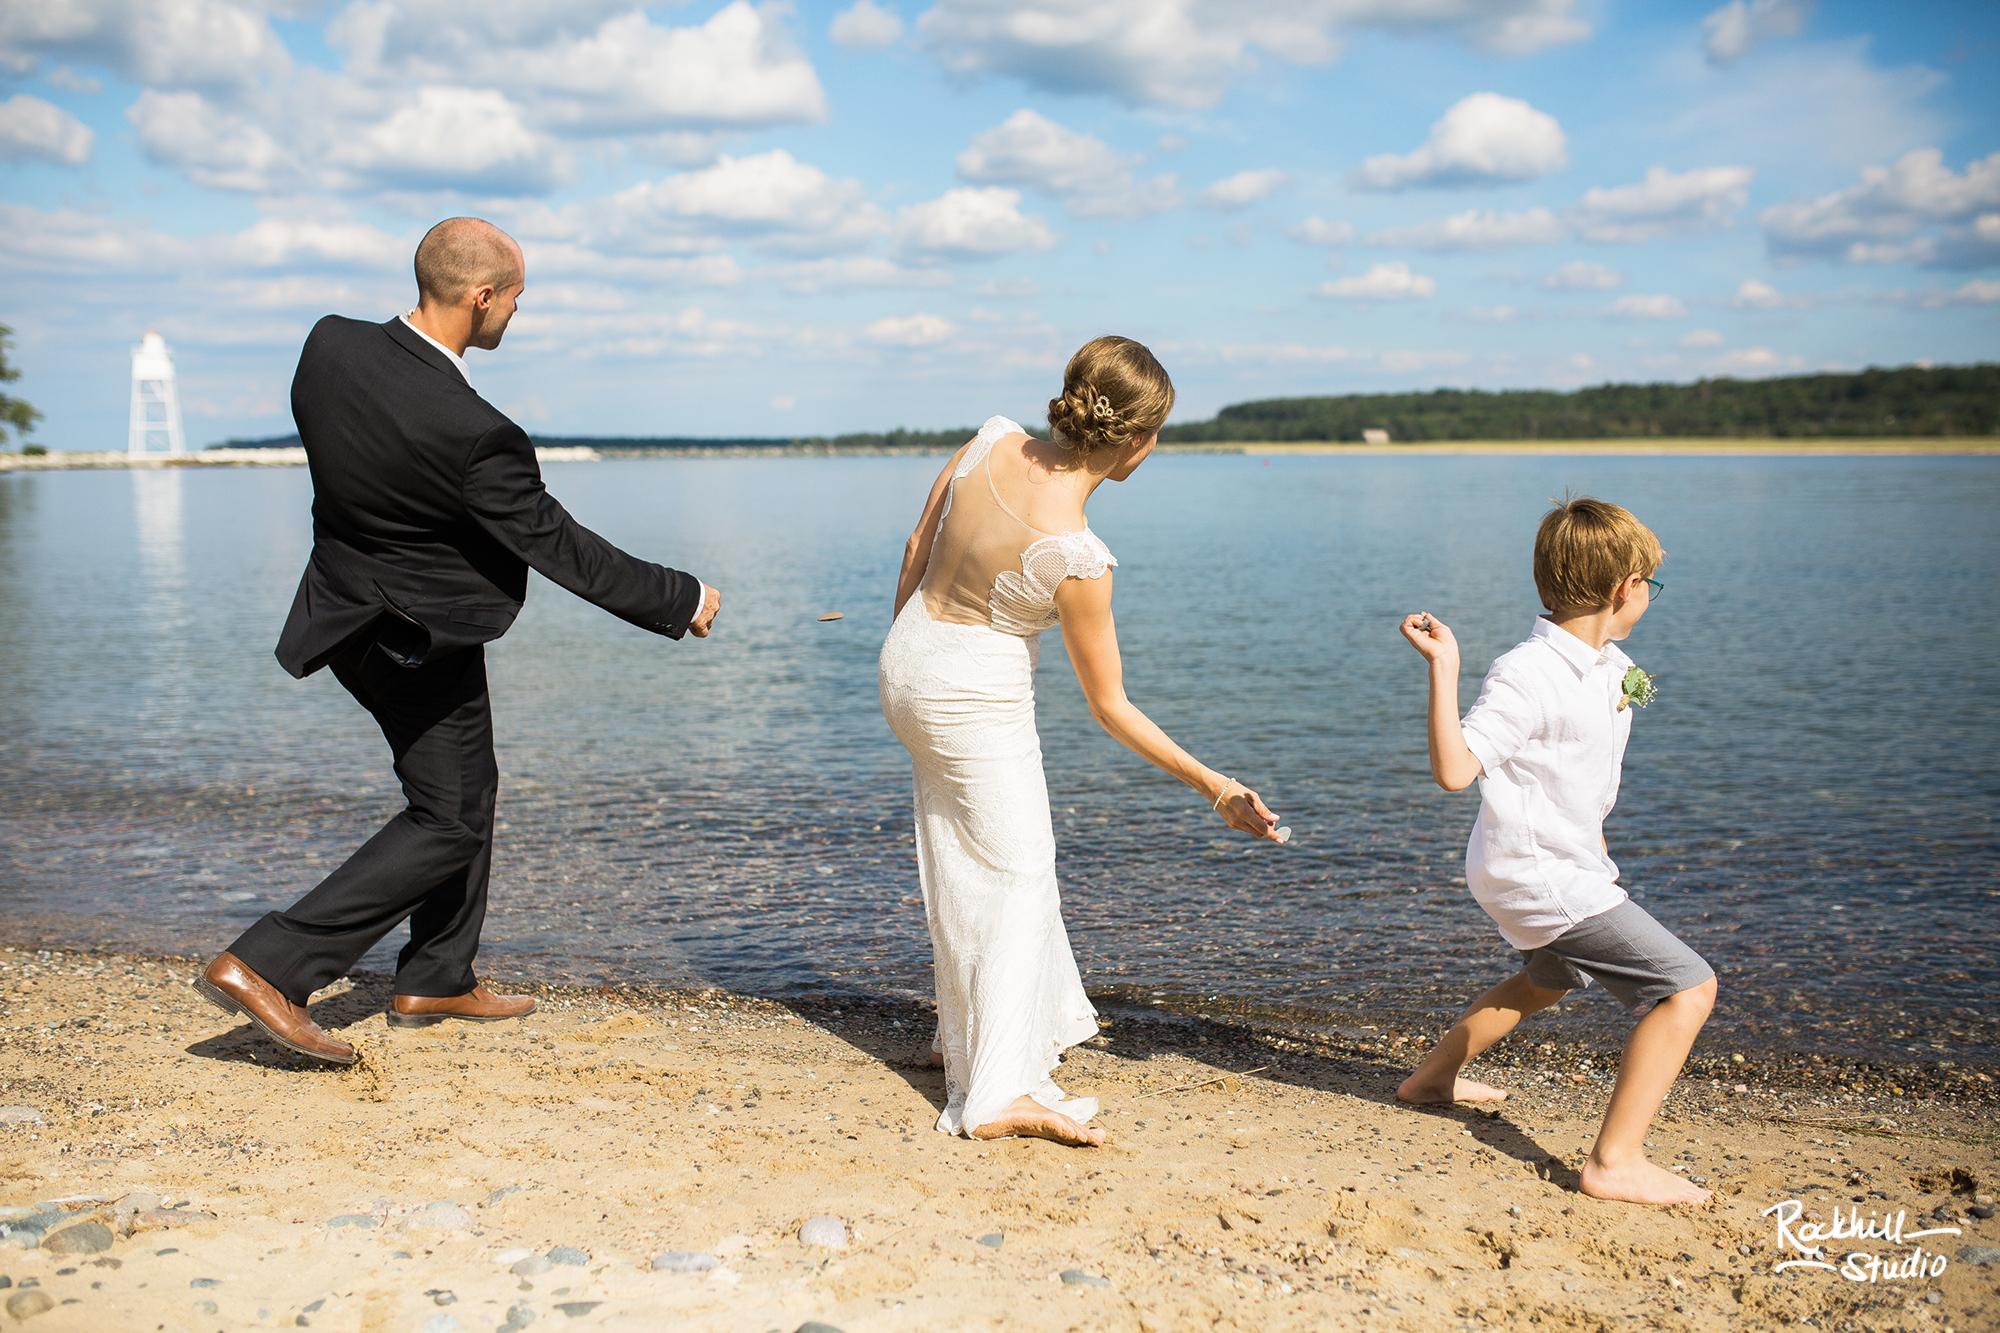 grand-marais-wedding-photography-upper-peninsula-northern-michigan-rockhill-57.jpg